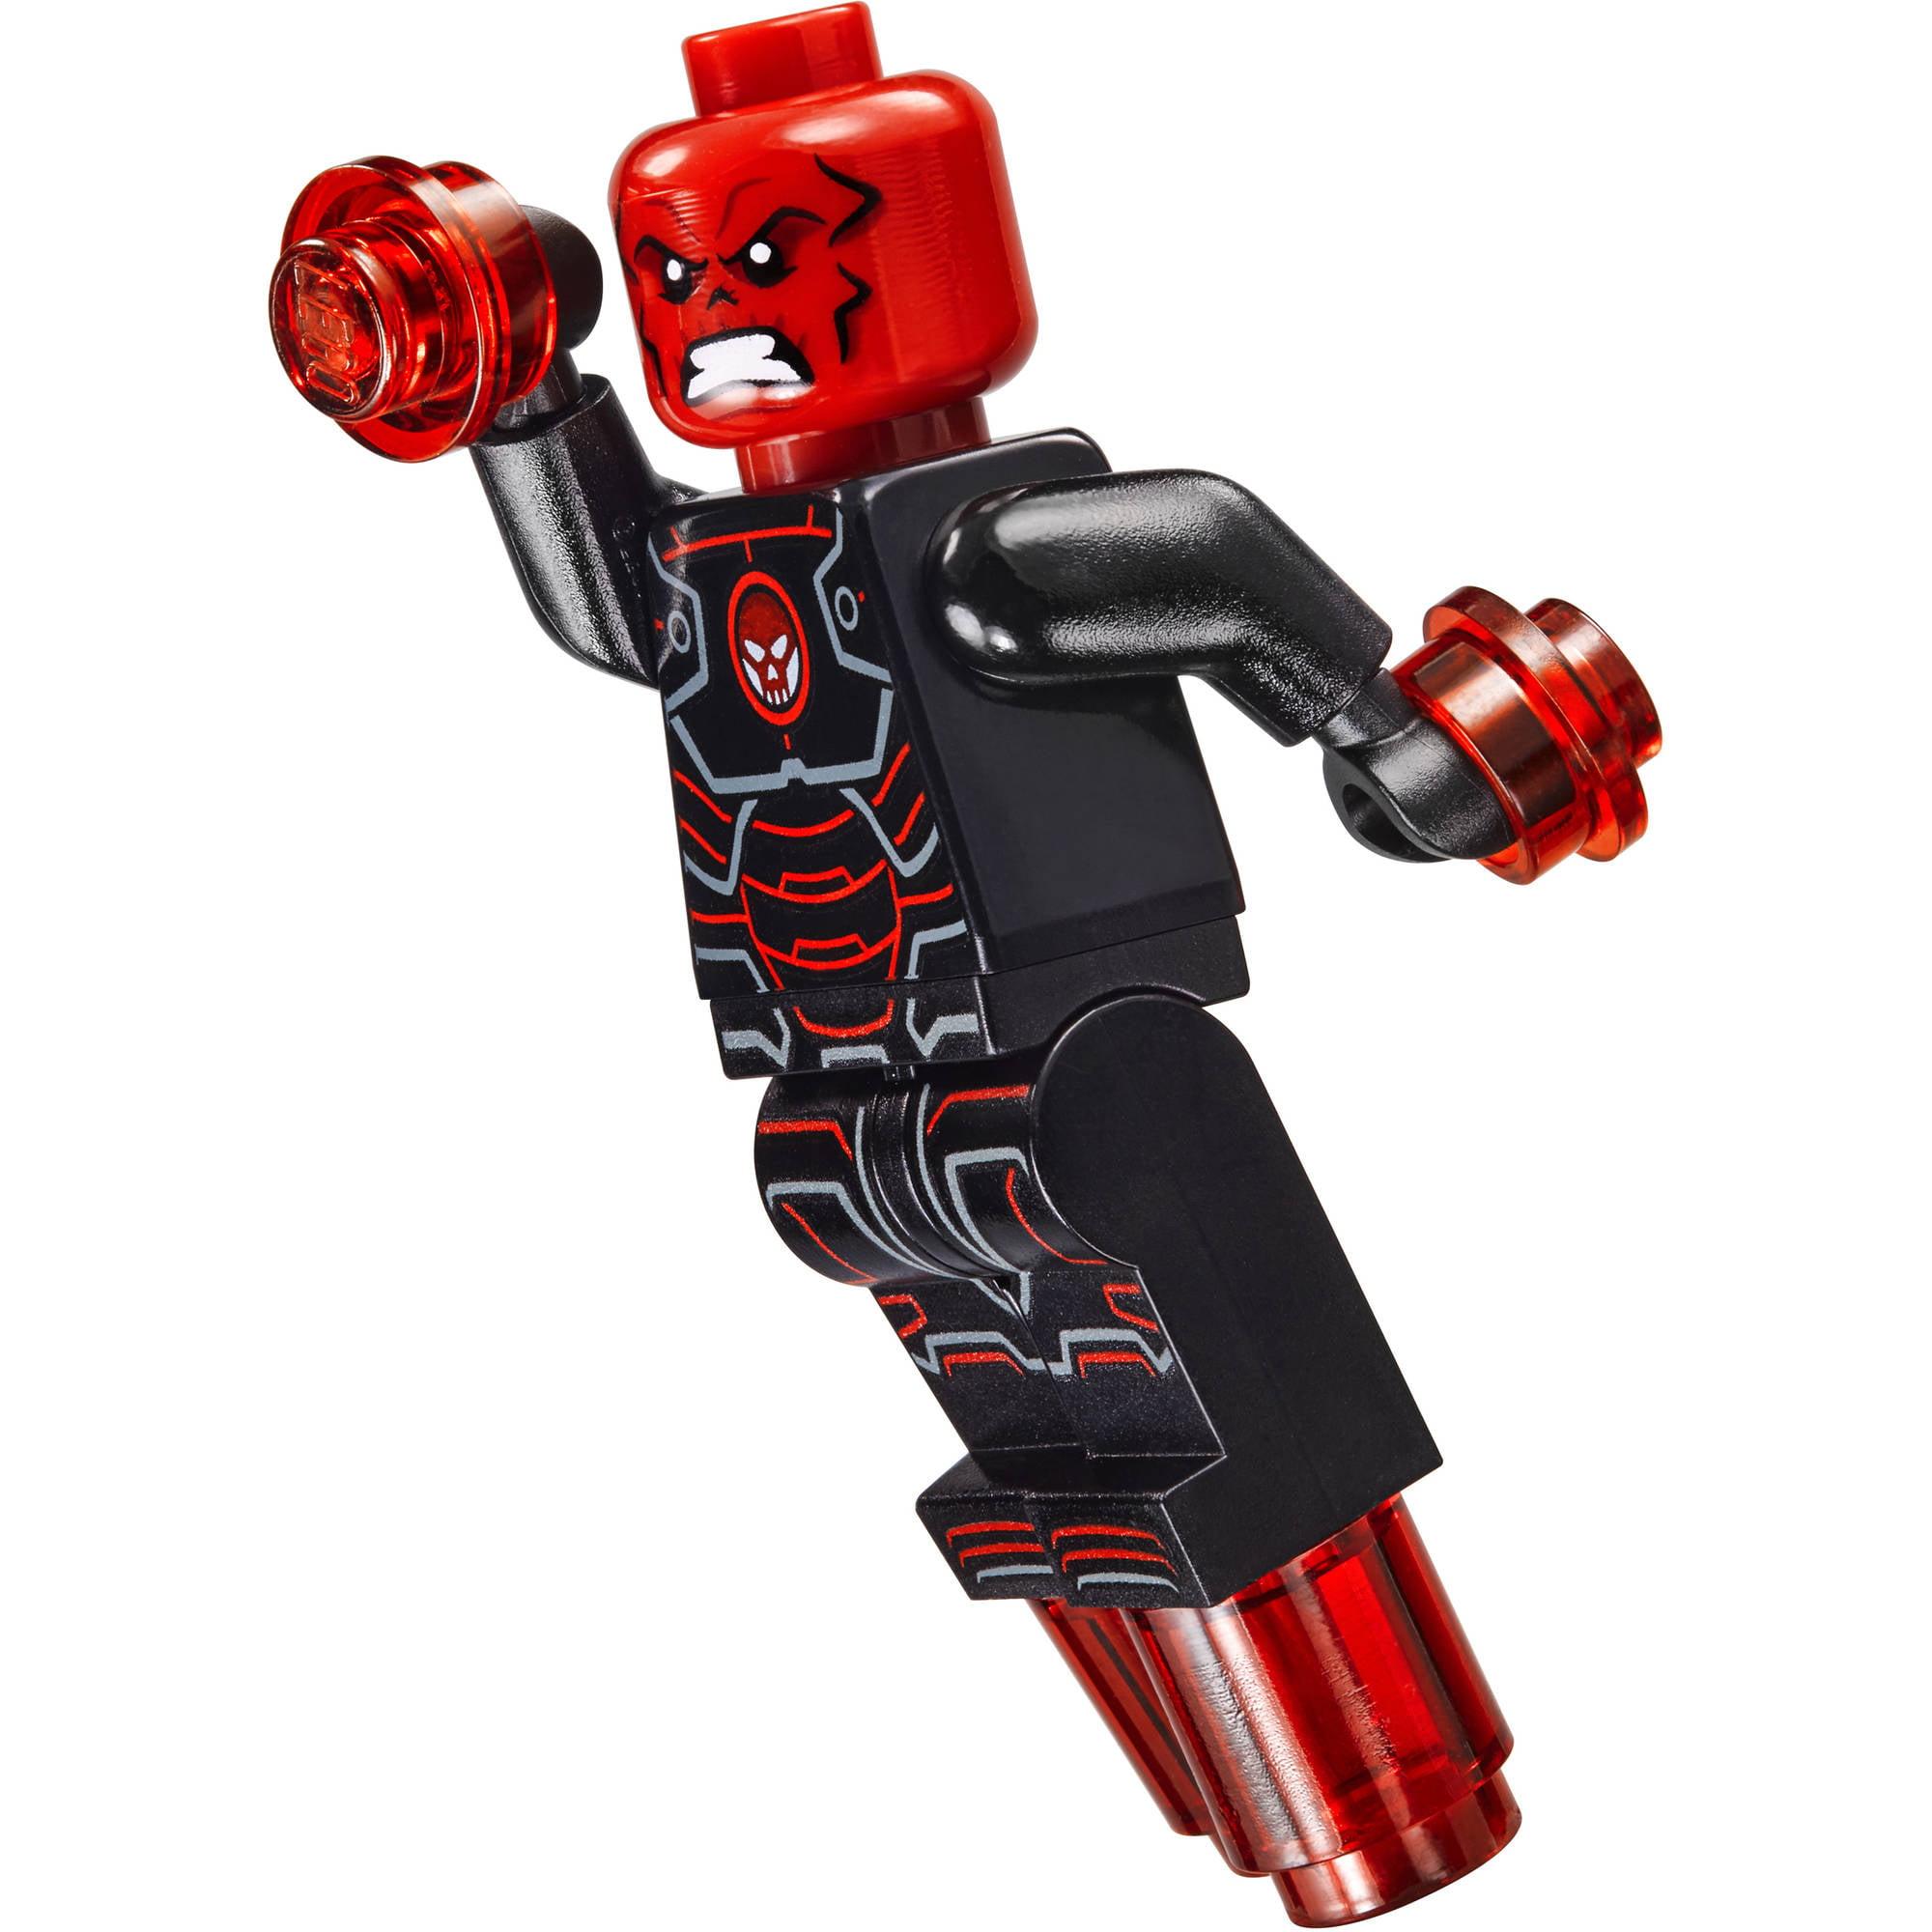 LEGO Bau- & Konstruktionsspielzeug Baukästen & Konstruktion Lego 76048 Super Heroes Iron Skull Sub Attack NEU in OVP